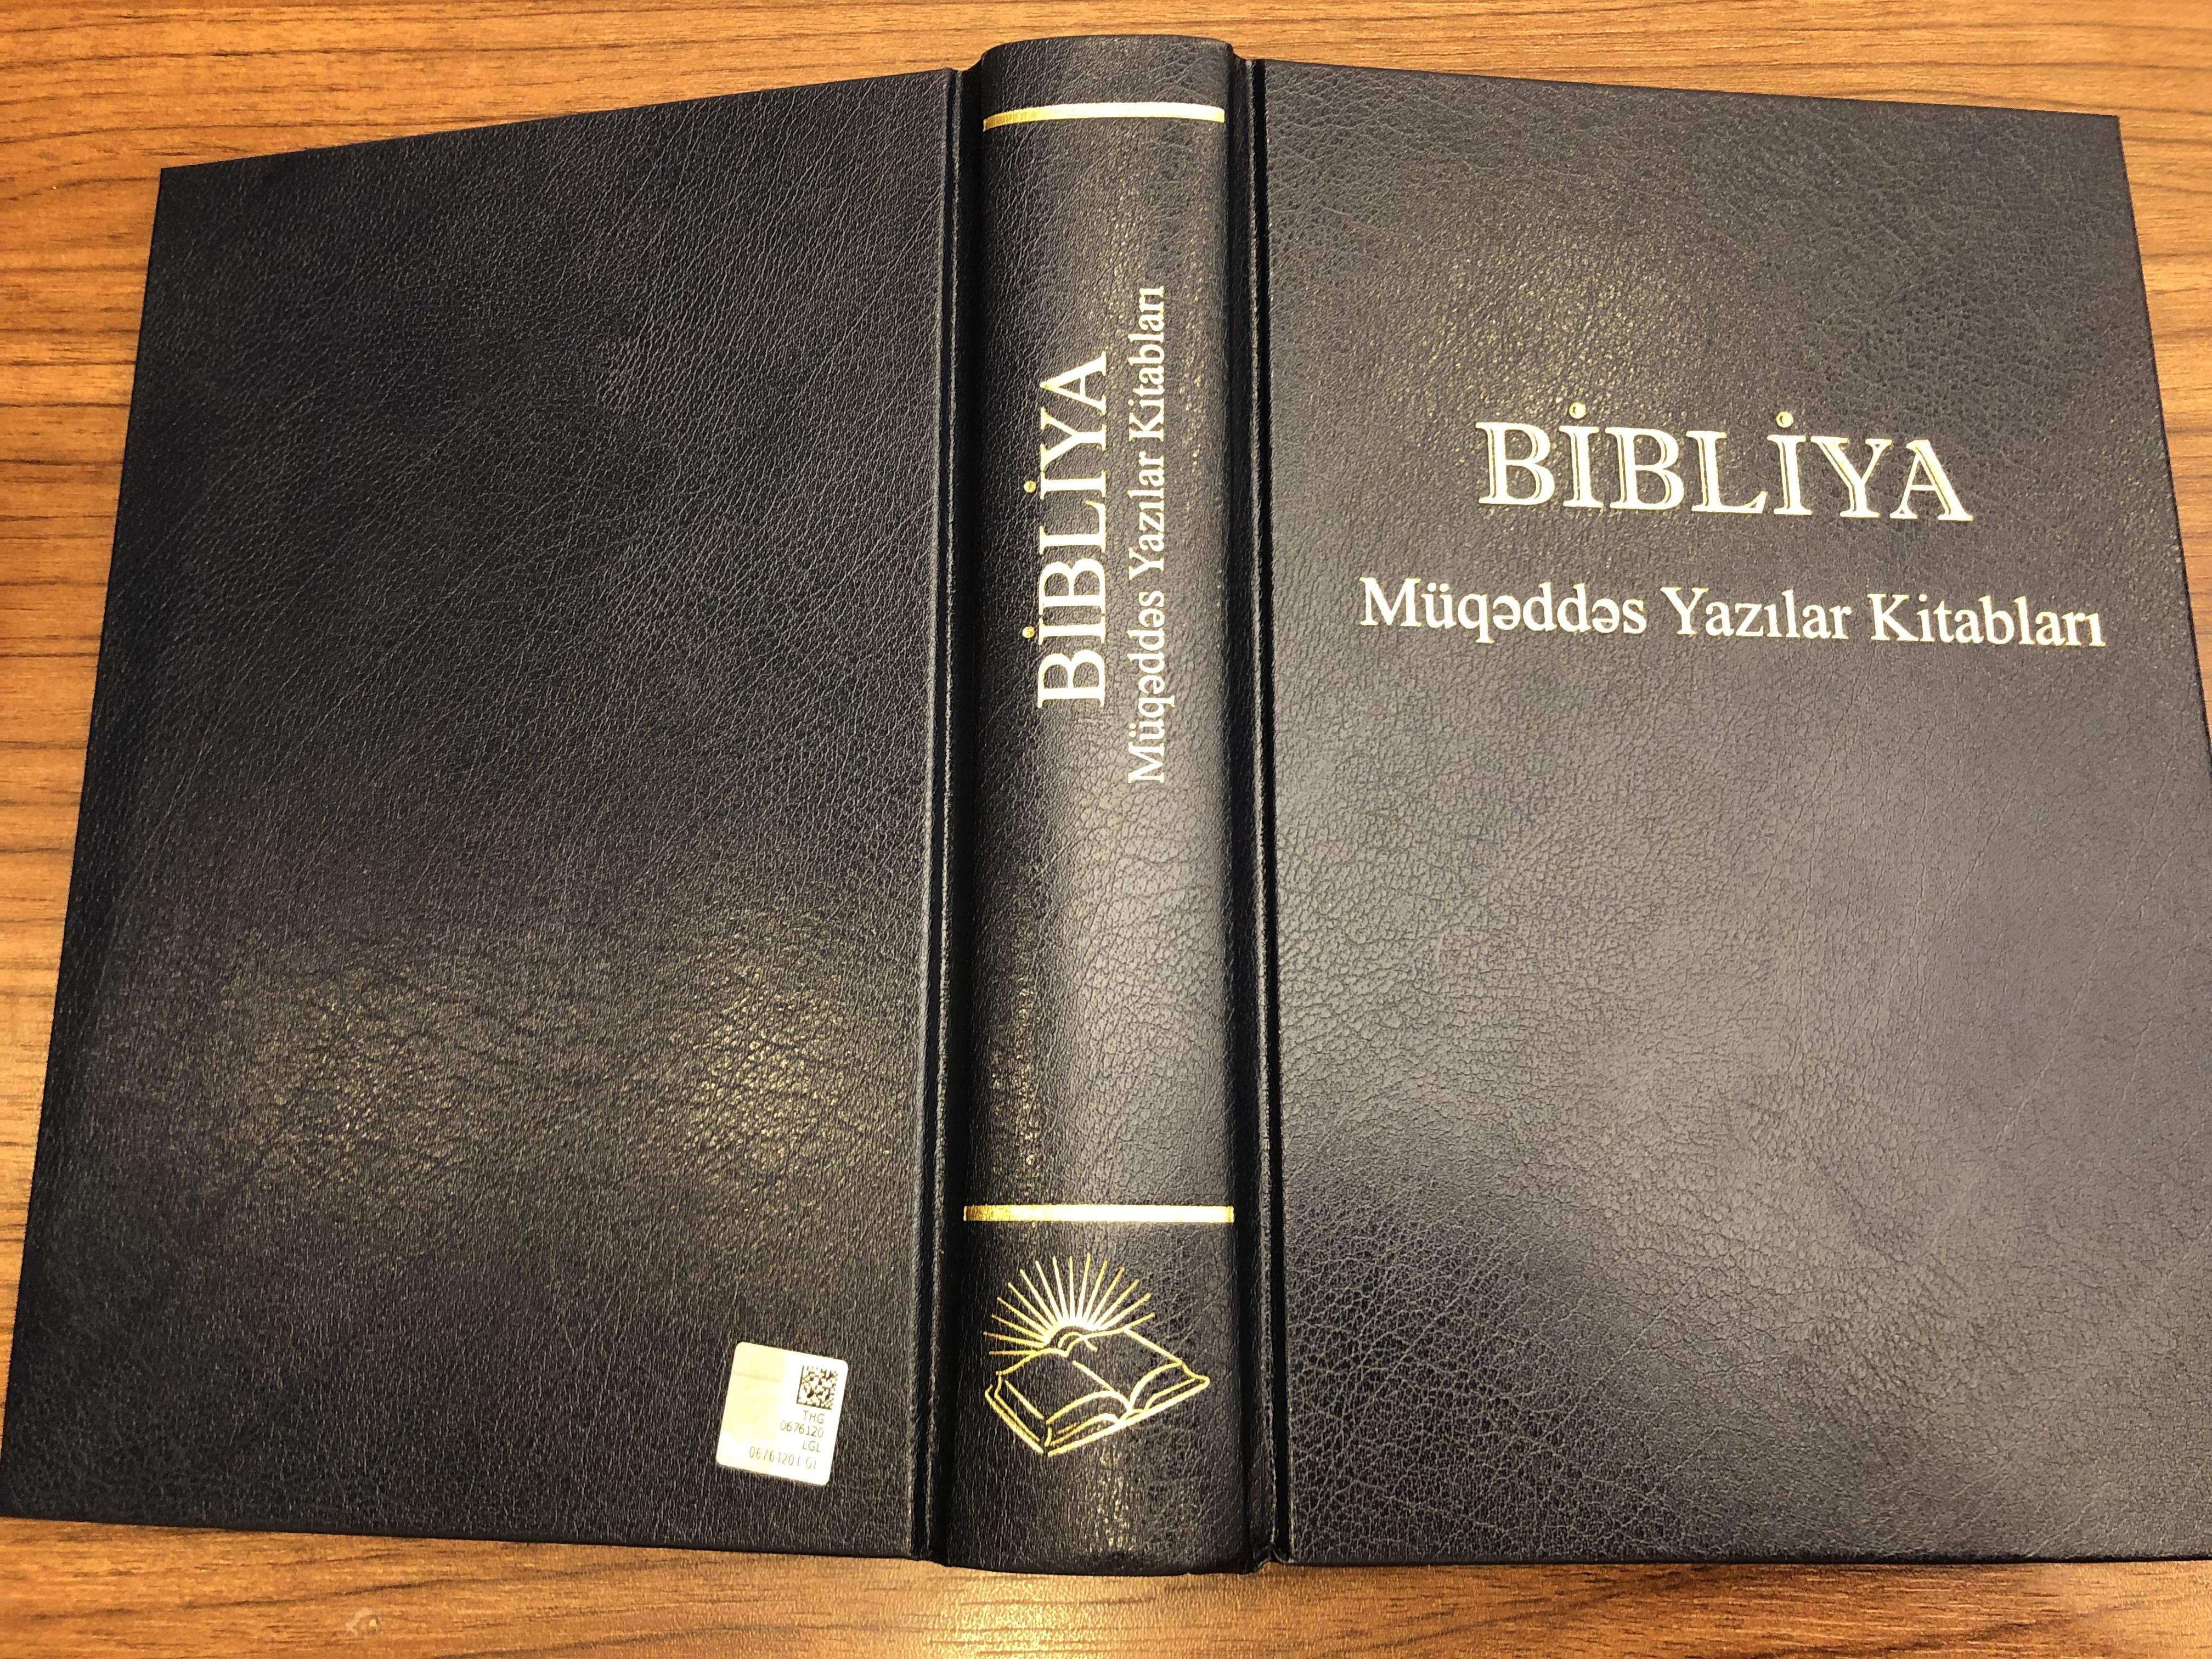 bibliya-azeri-language-with-thumb-index-and-color-maps-text-azerbaijani-latin-a063ti-21-.jpg